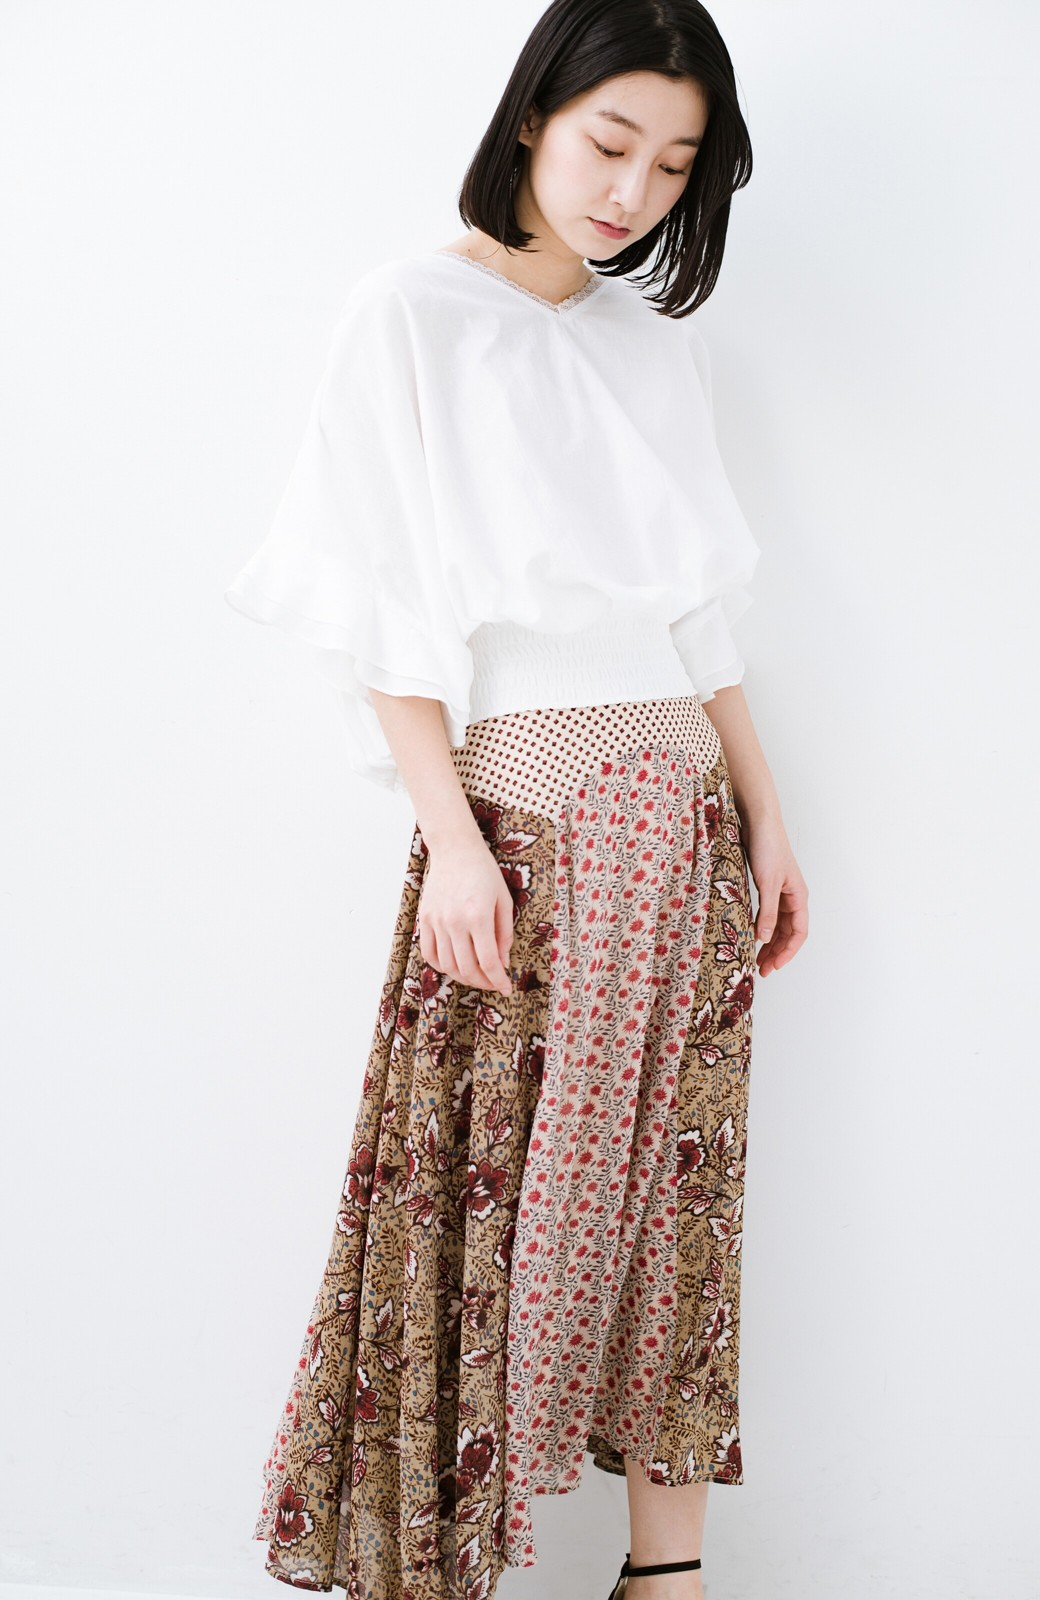 haco! 【洗濯機洗いOK】シンプルなトップスに合わせるだけでかわいくなれる MIX柄スカート <ベージュ系その他>の商品写真22